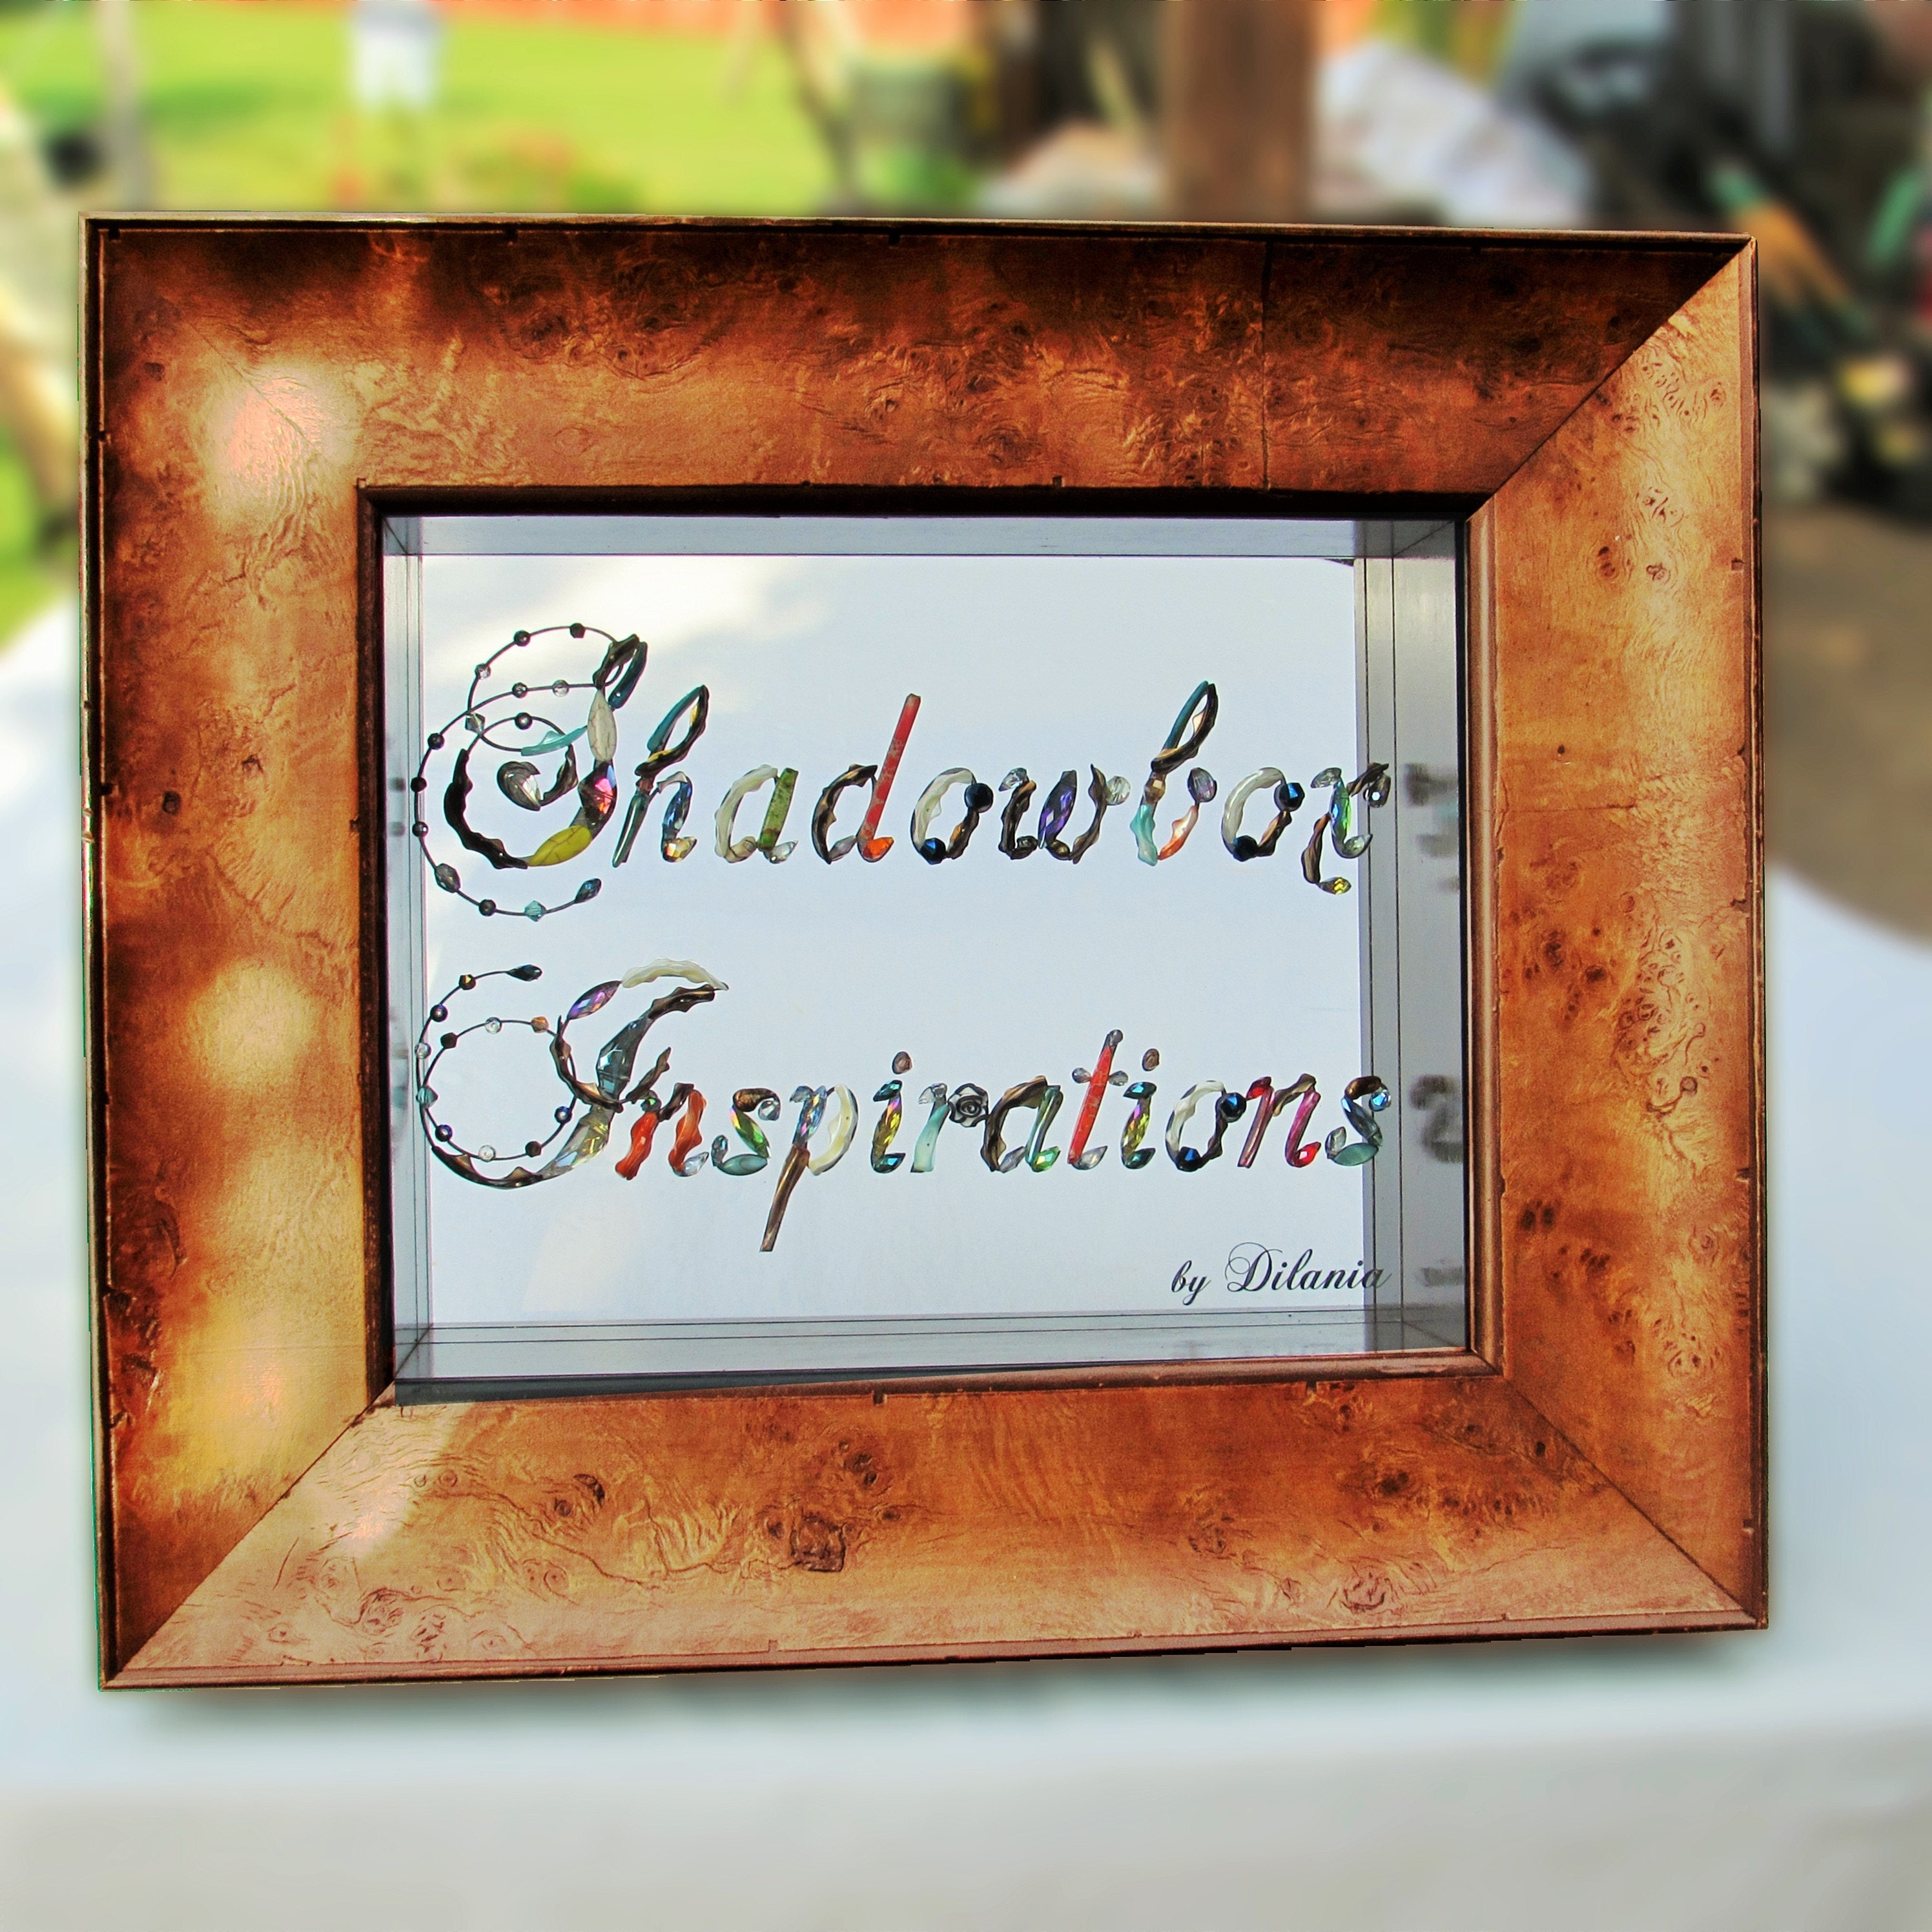 Shadowbox Inspirations by Dilania